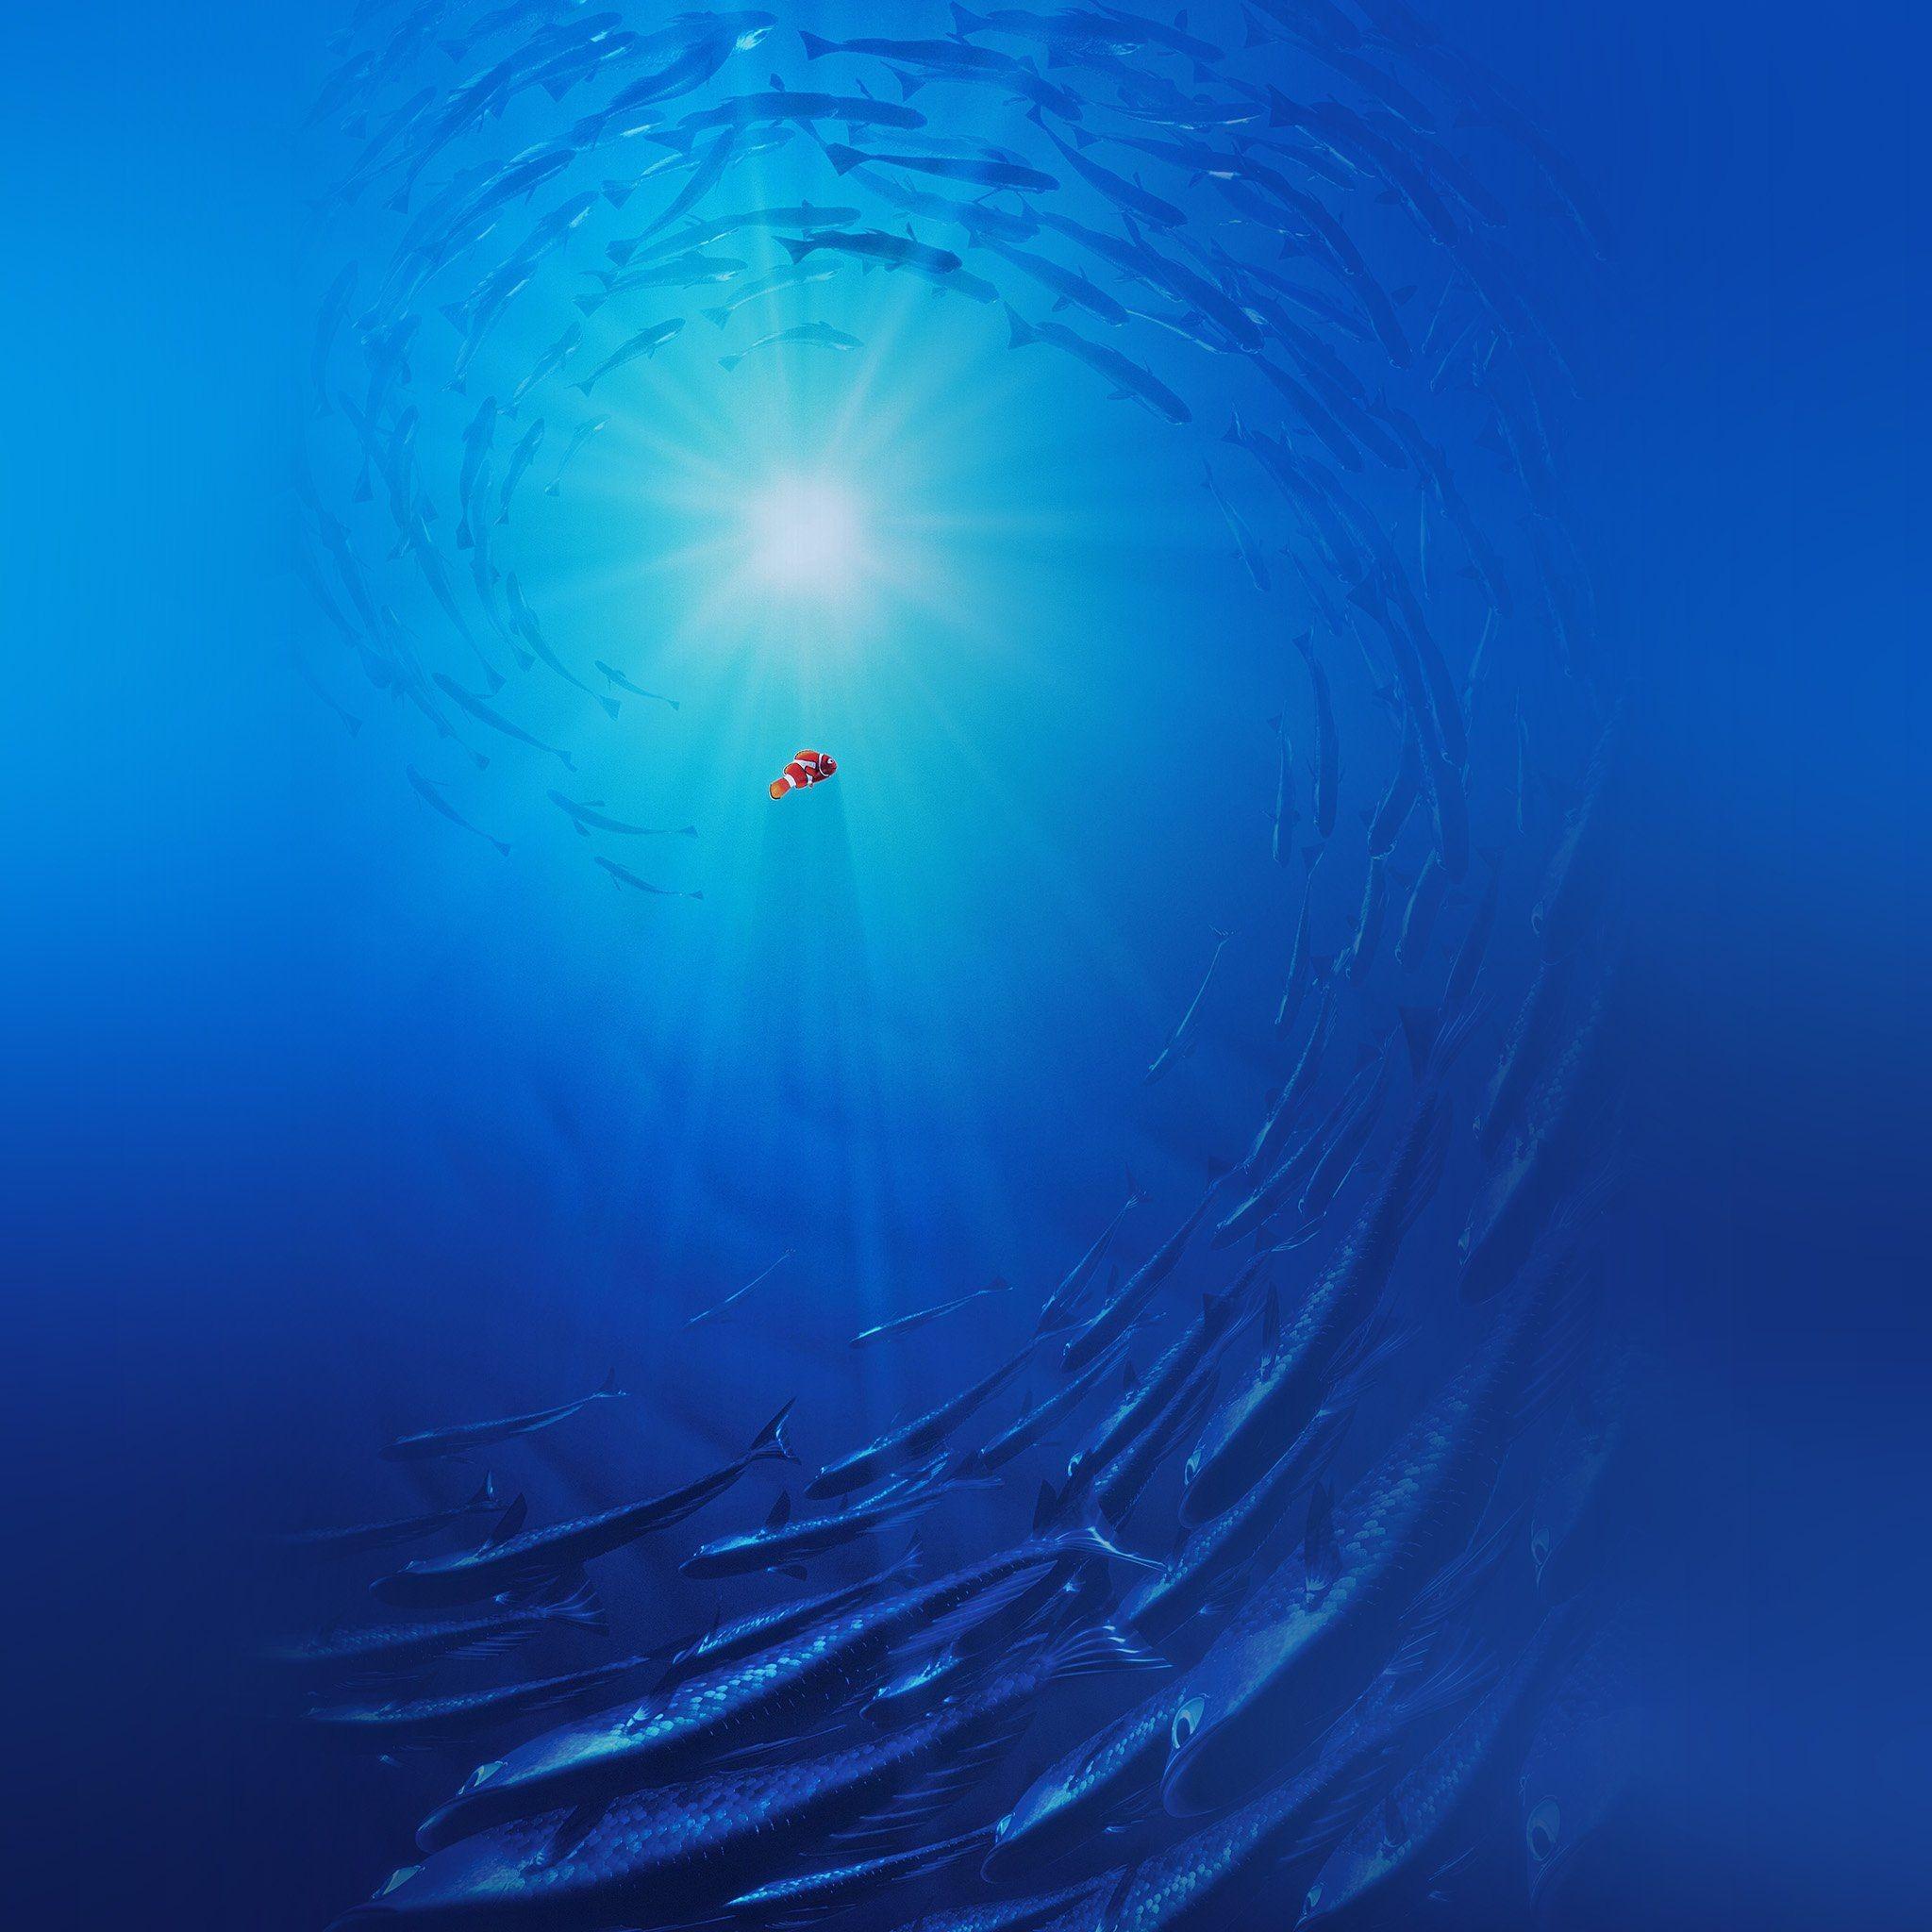 1920x1080 Finding Dory Wallpaper Movies Animation Hank Nemo